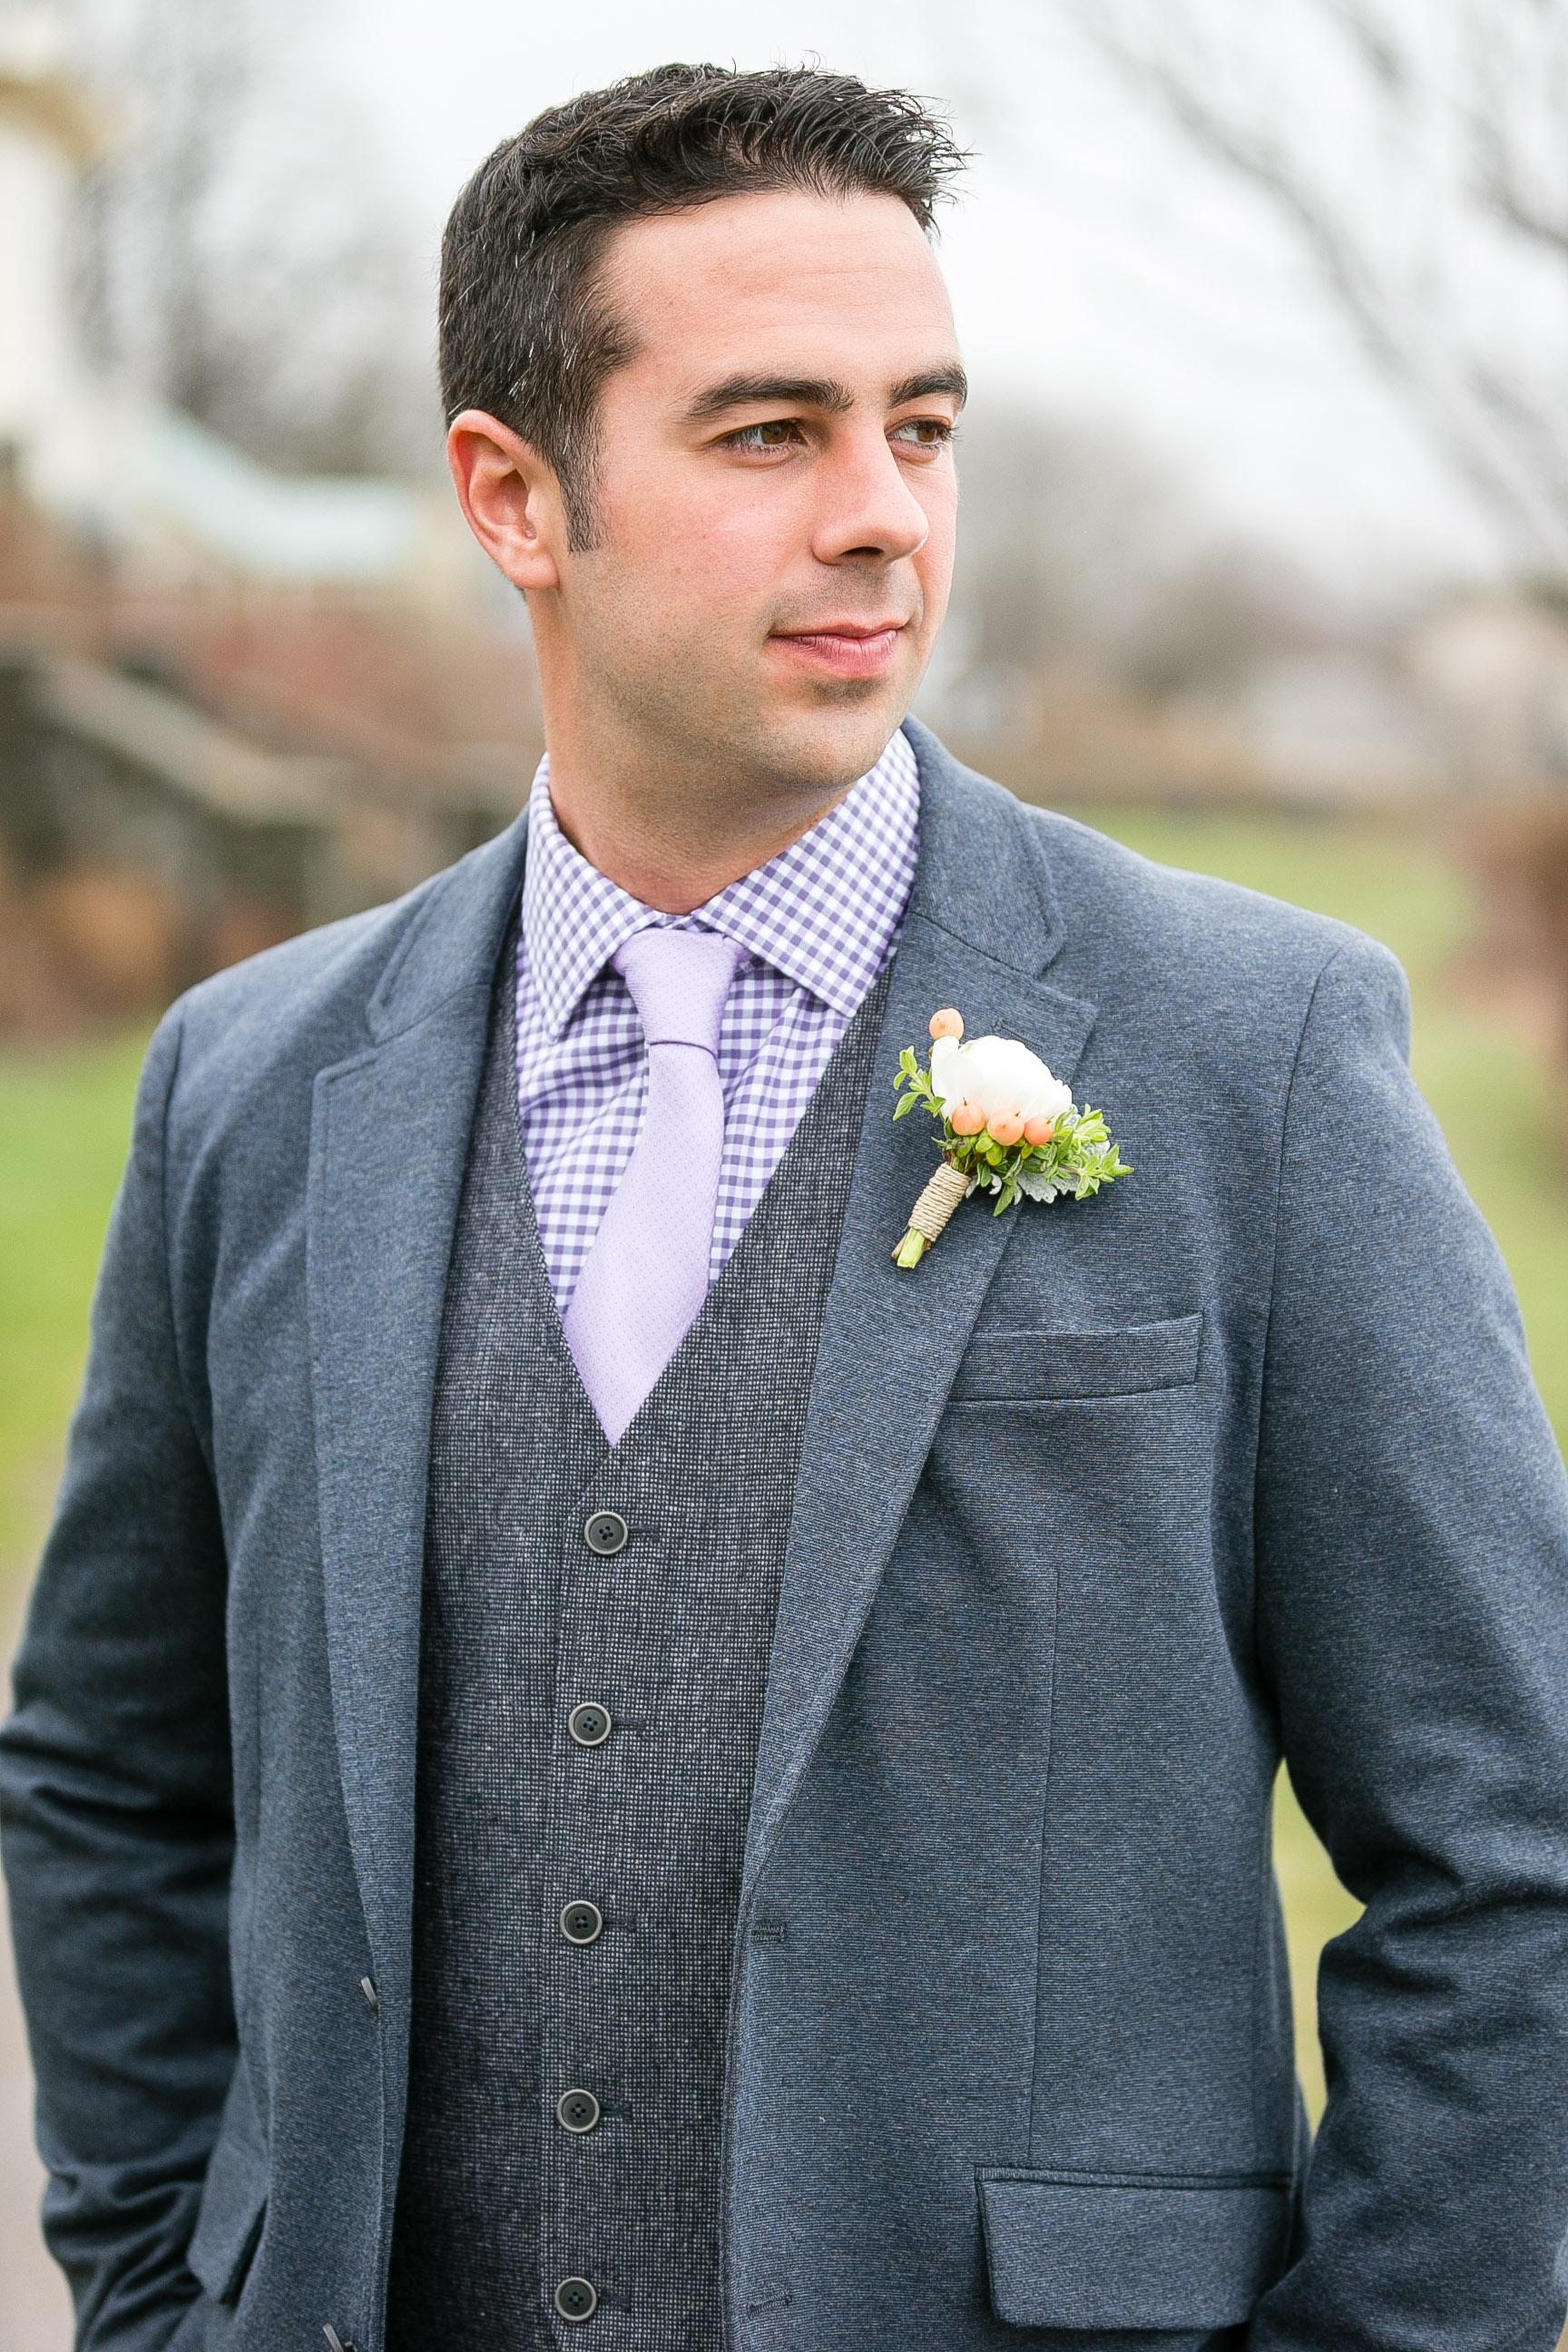 The-Chanler-at-Cliff-Walk-Newport-RI-Wedding-Photojournalistic-Jacek-Dolata-Photography.jpg